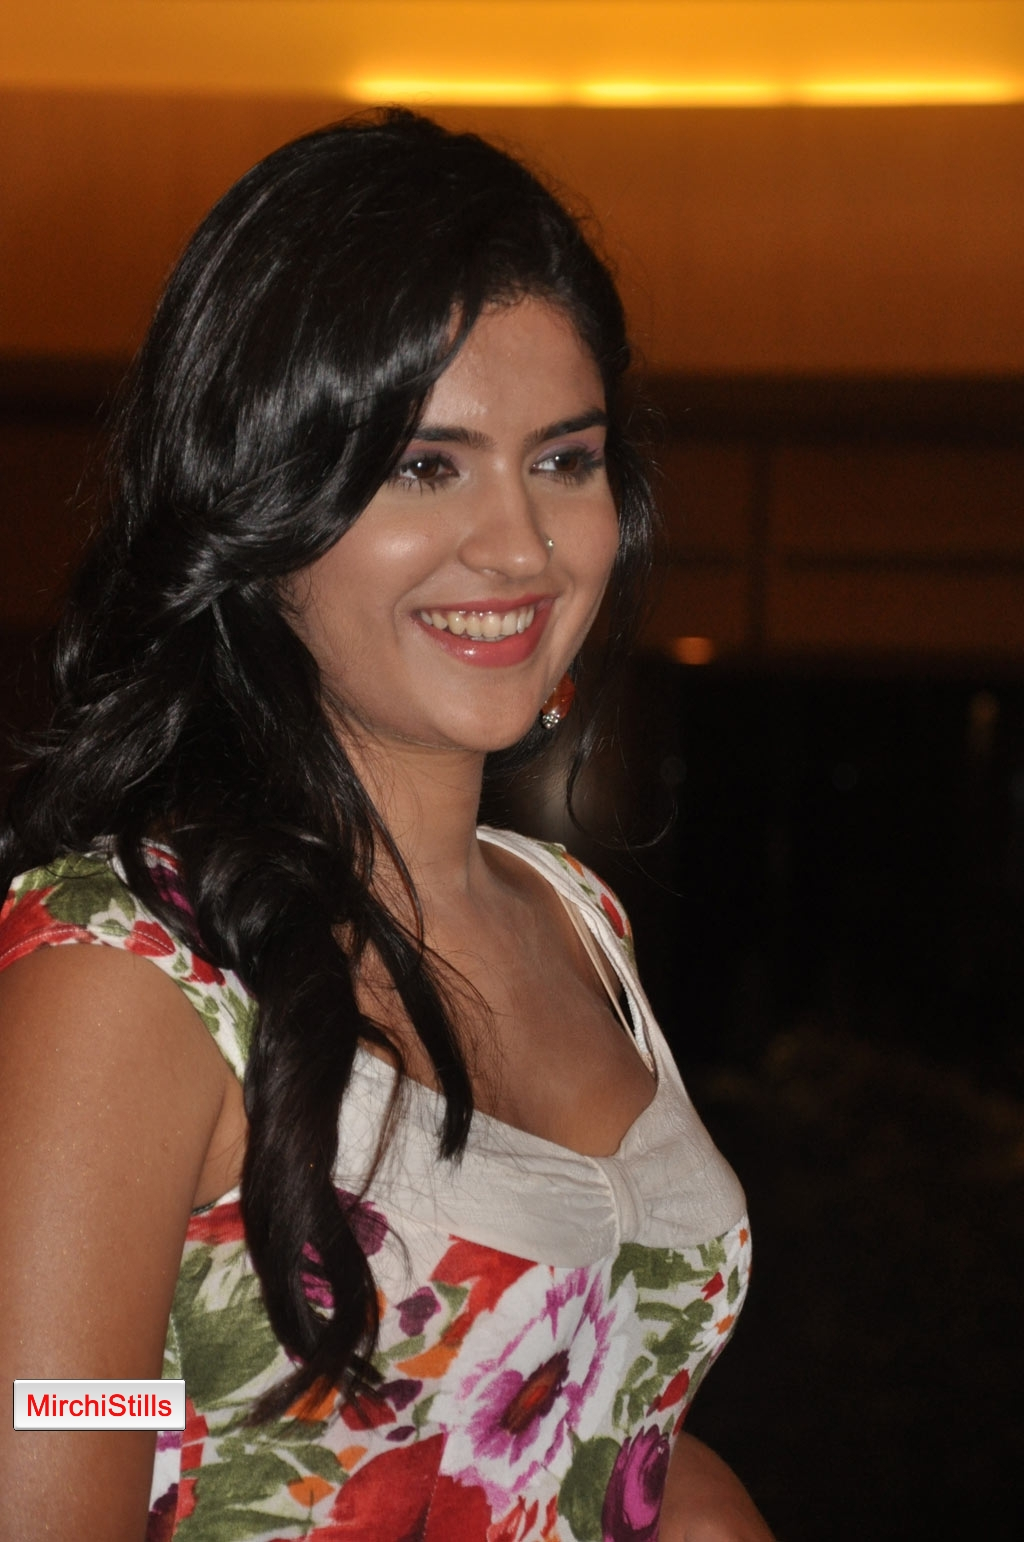 Mirchi Stills: Deeksha Seth Hot Photo Stills Rajapattai ...